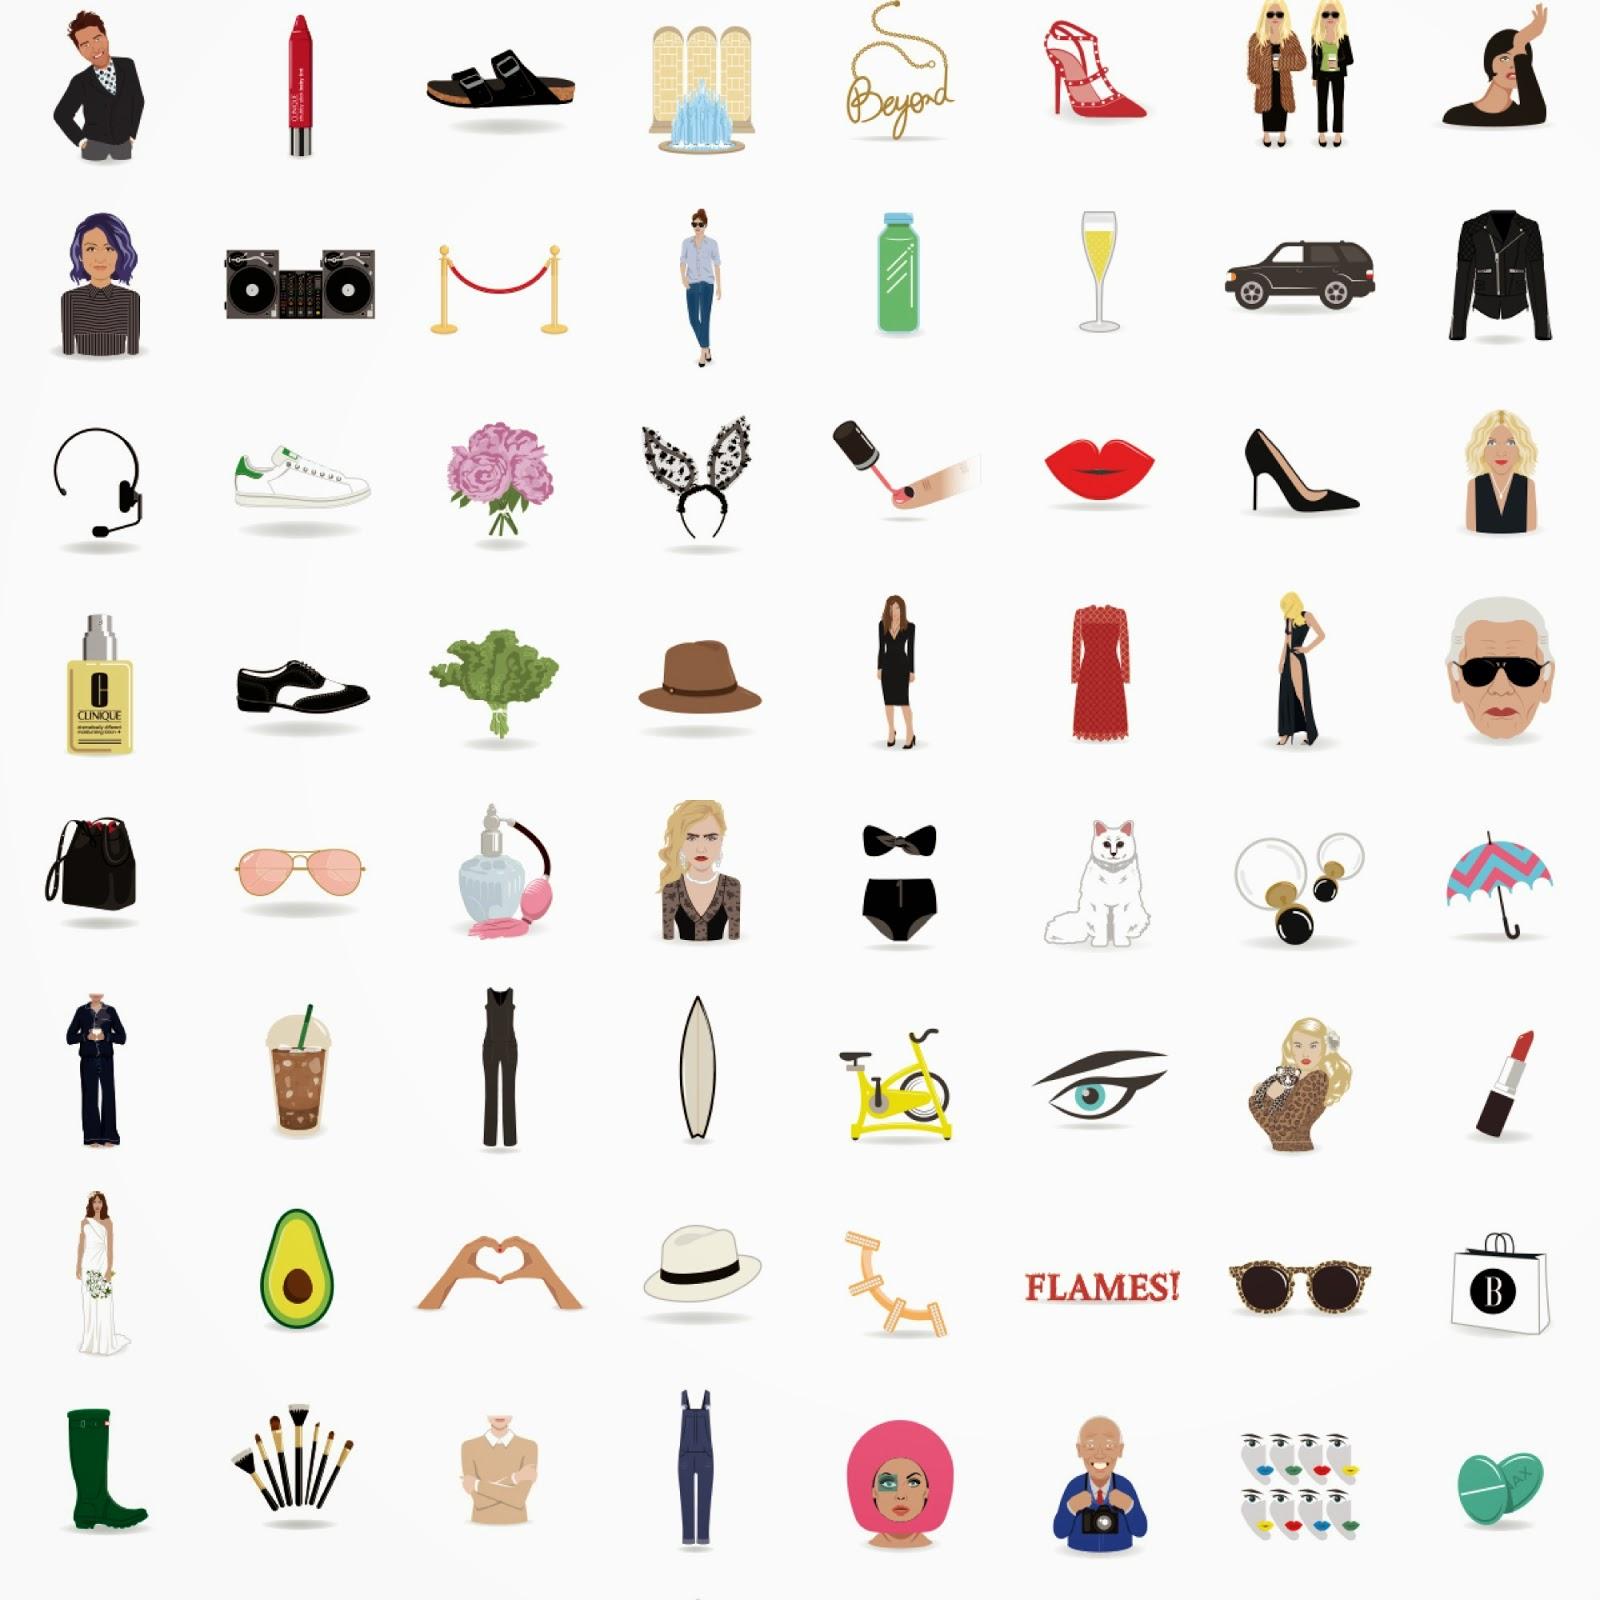 harpers bazaar fashion emojis